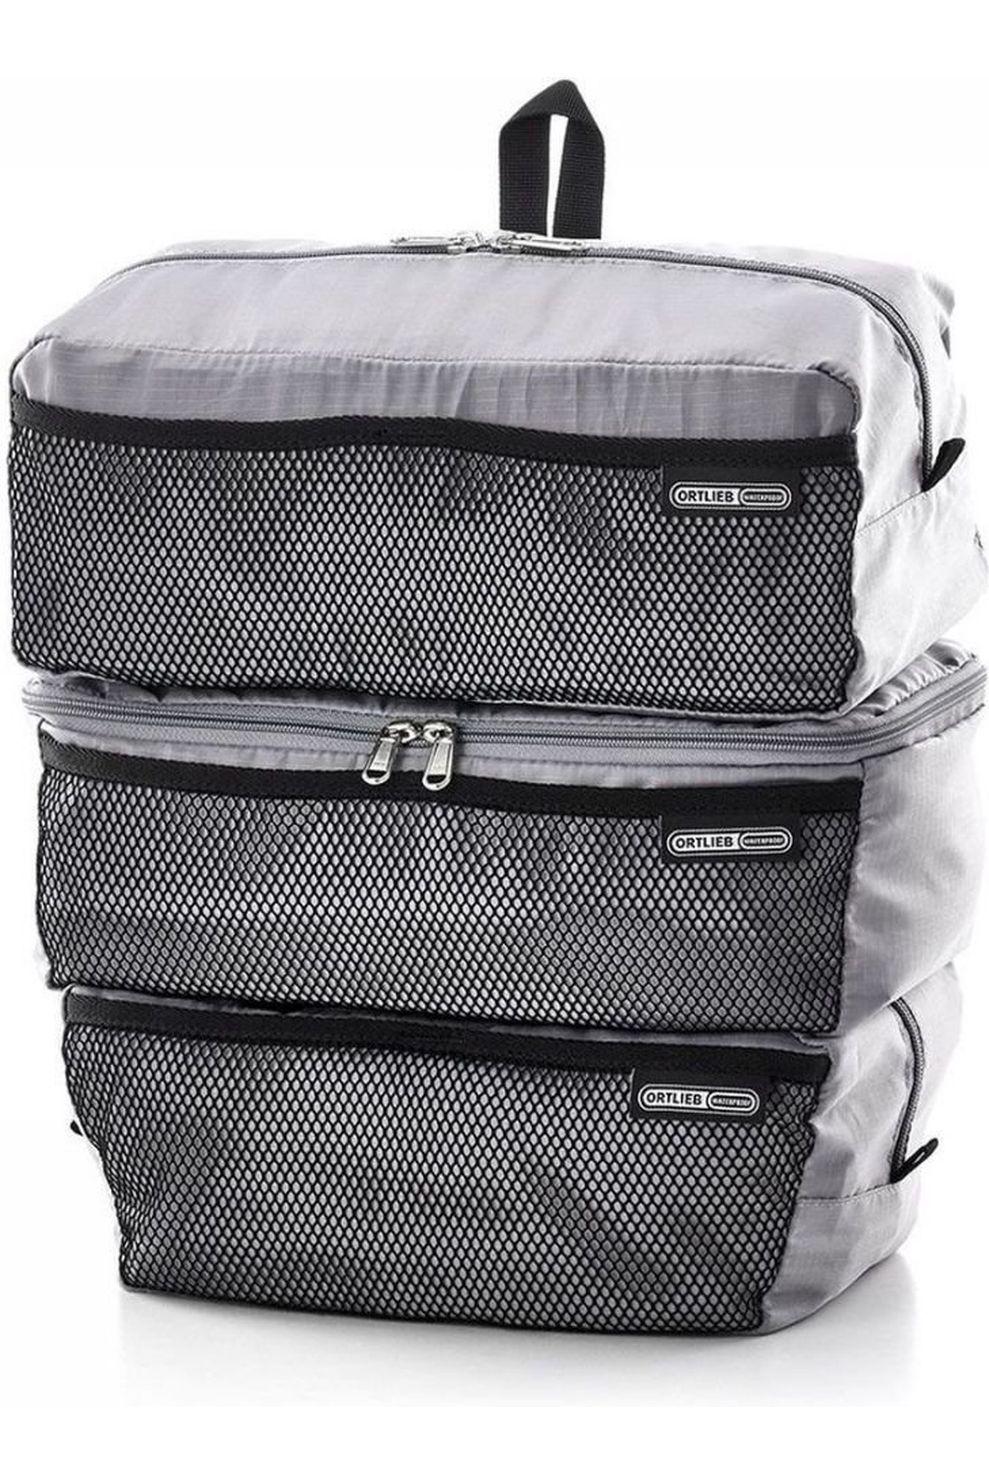 ORTLIEB Accessoire Packing Cubes - Grijs